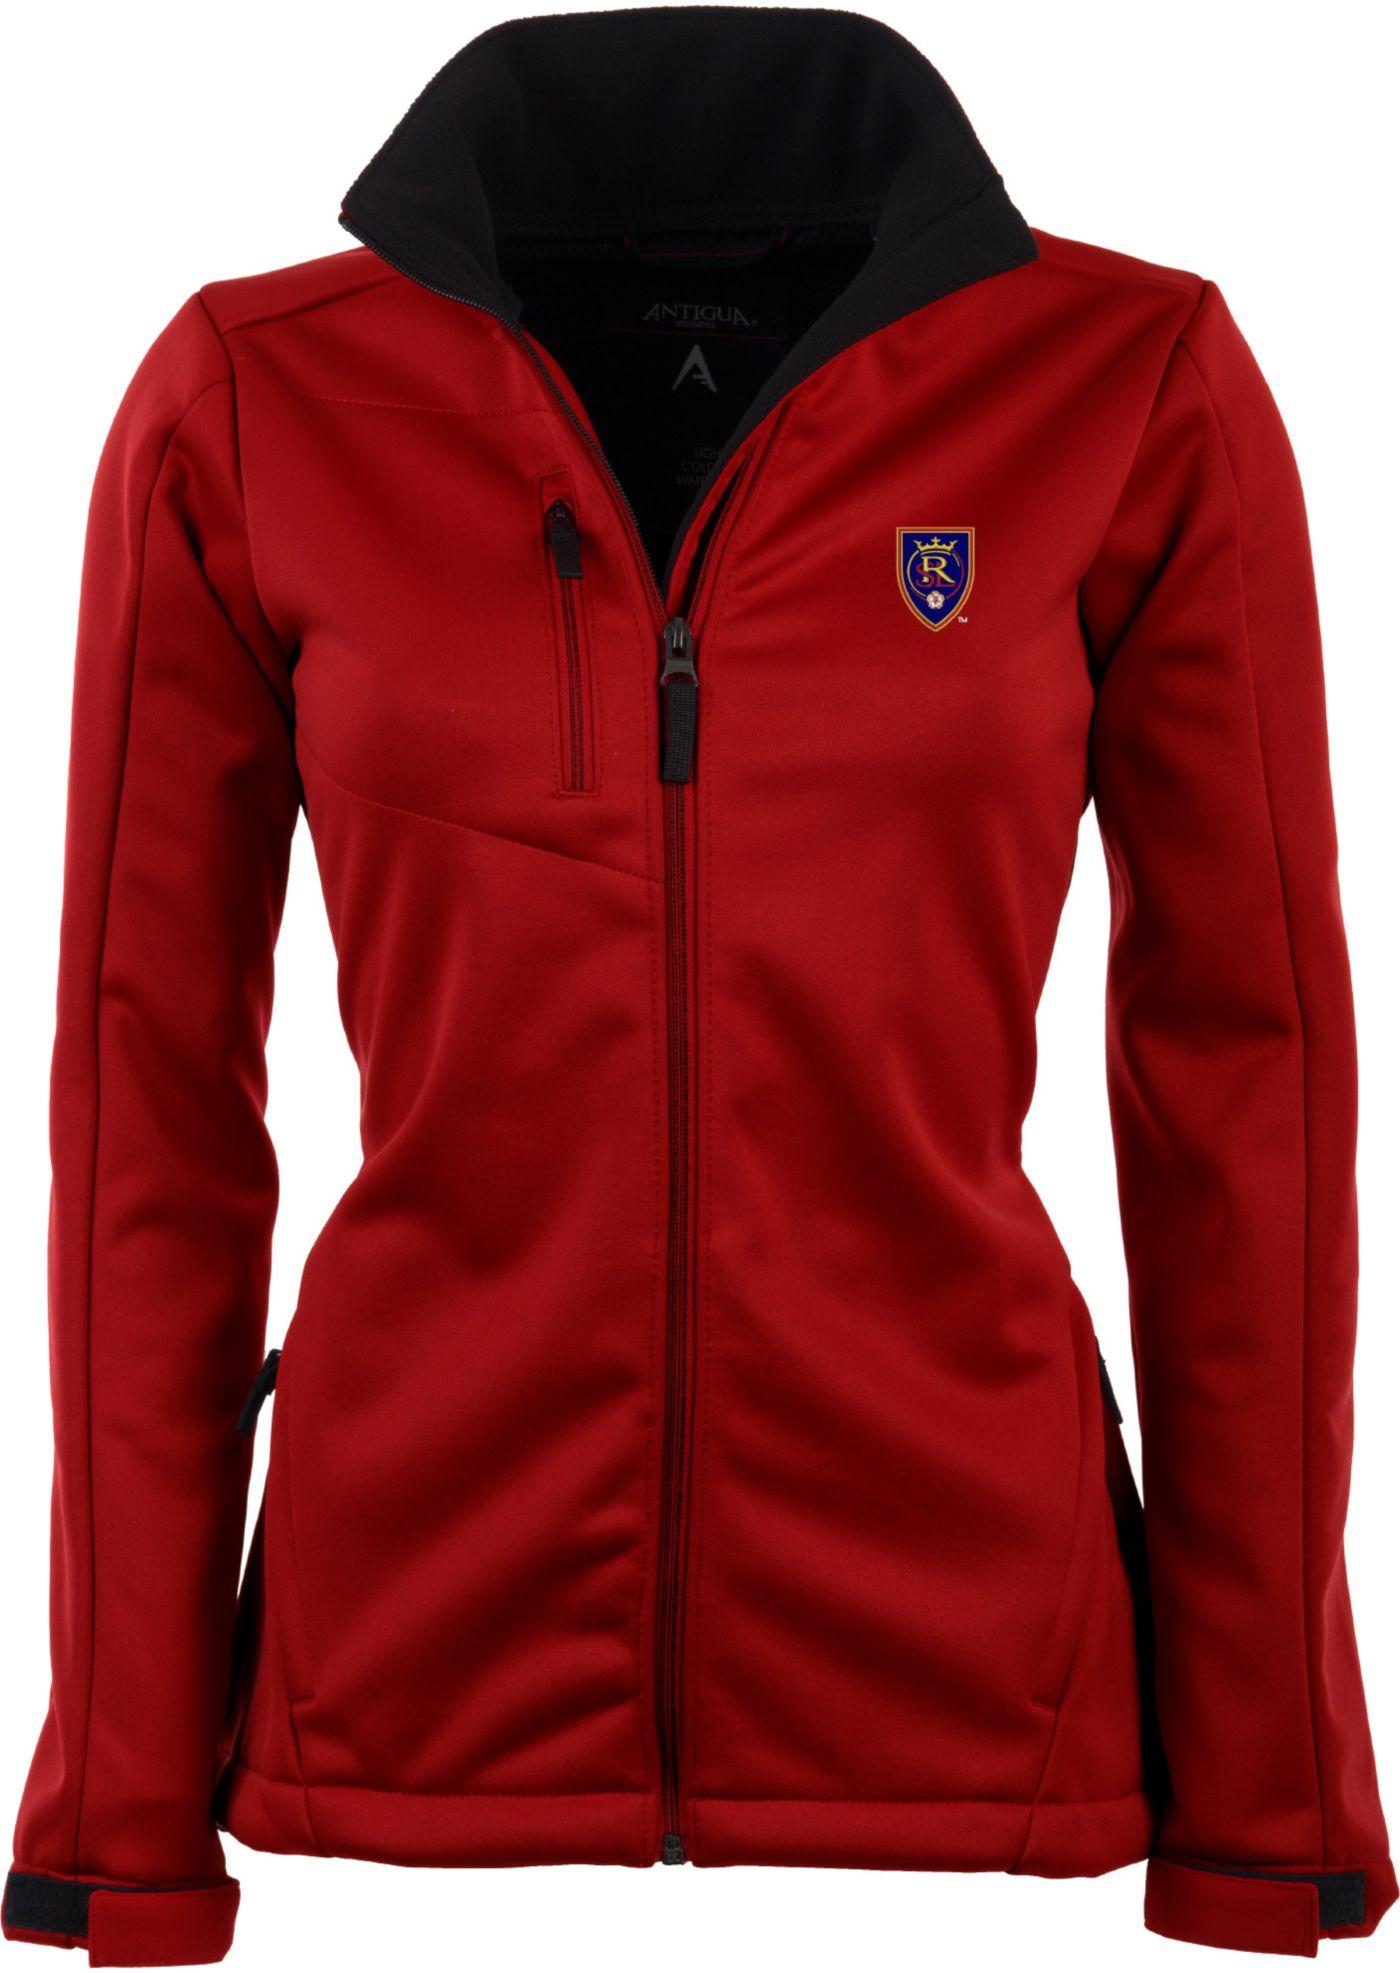 Antigua Women's Real Salt Lake Traverse Red Soft-Shell Full-Zip Jacket